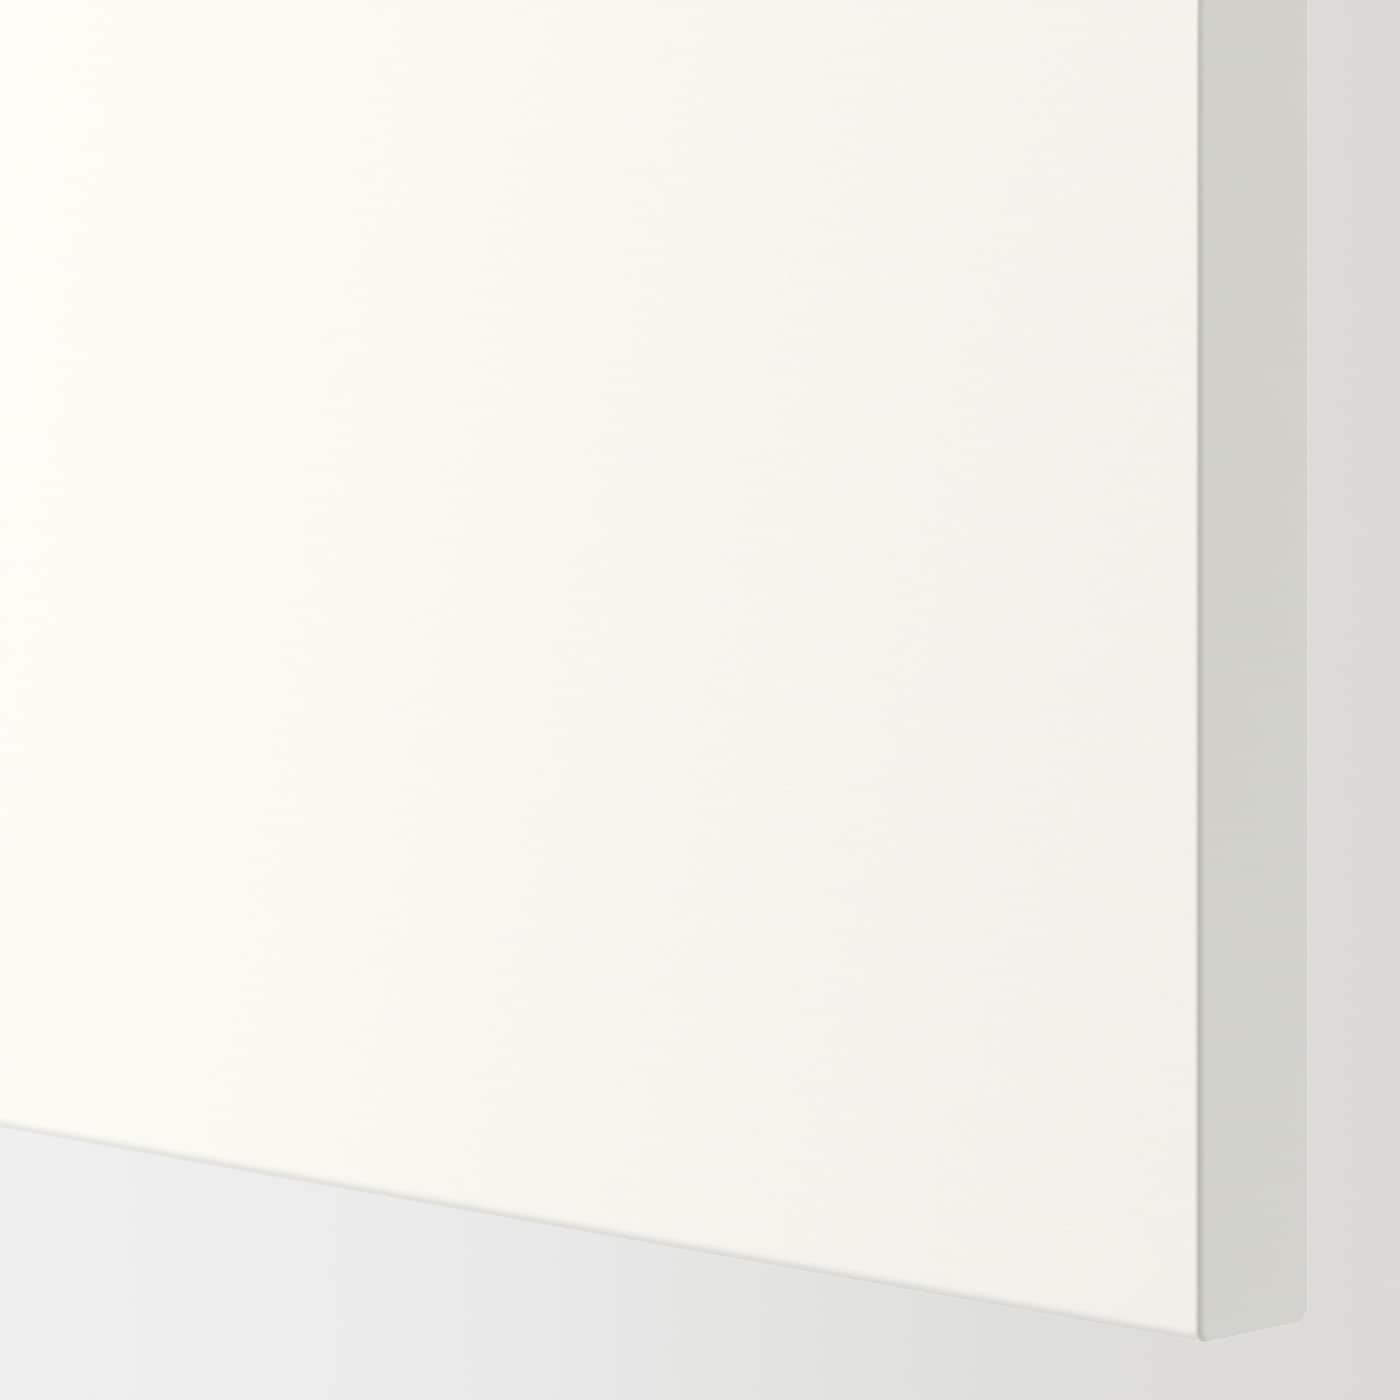 ENHET خزانة قاعدة مع رف/أبواب, أبيض, 80x62x75 سم